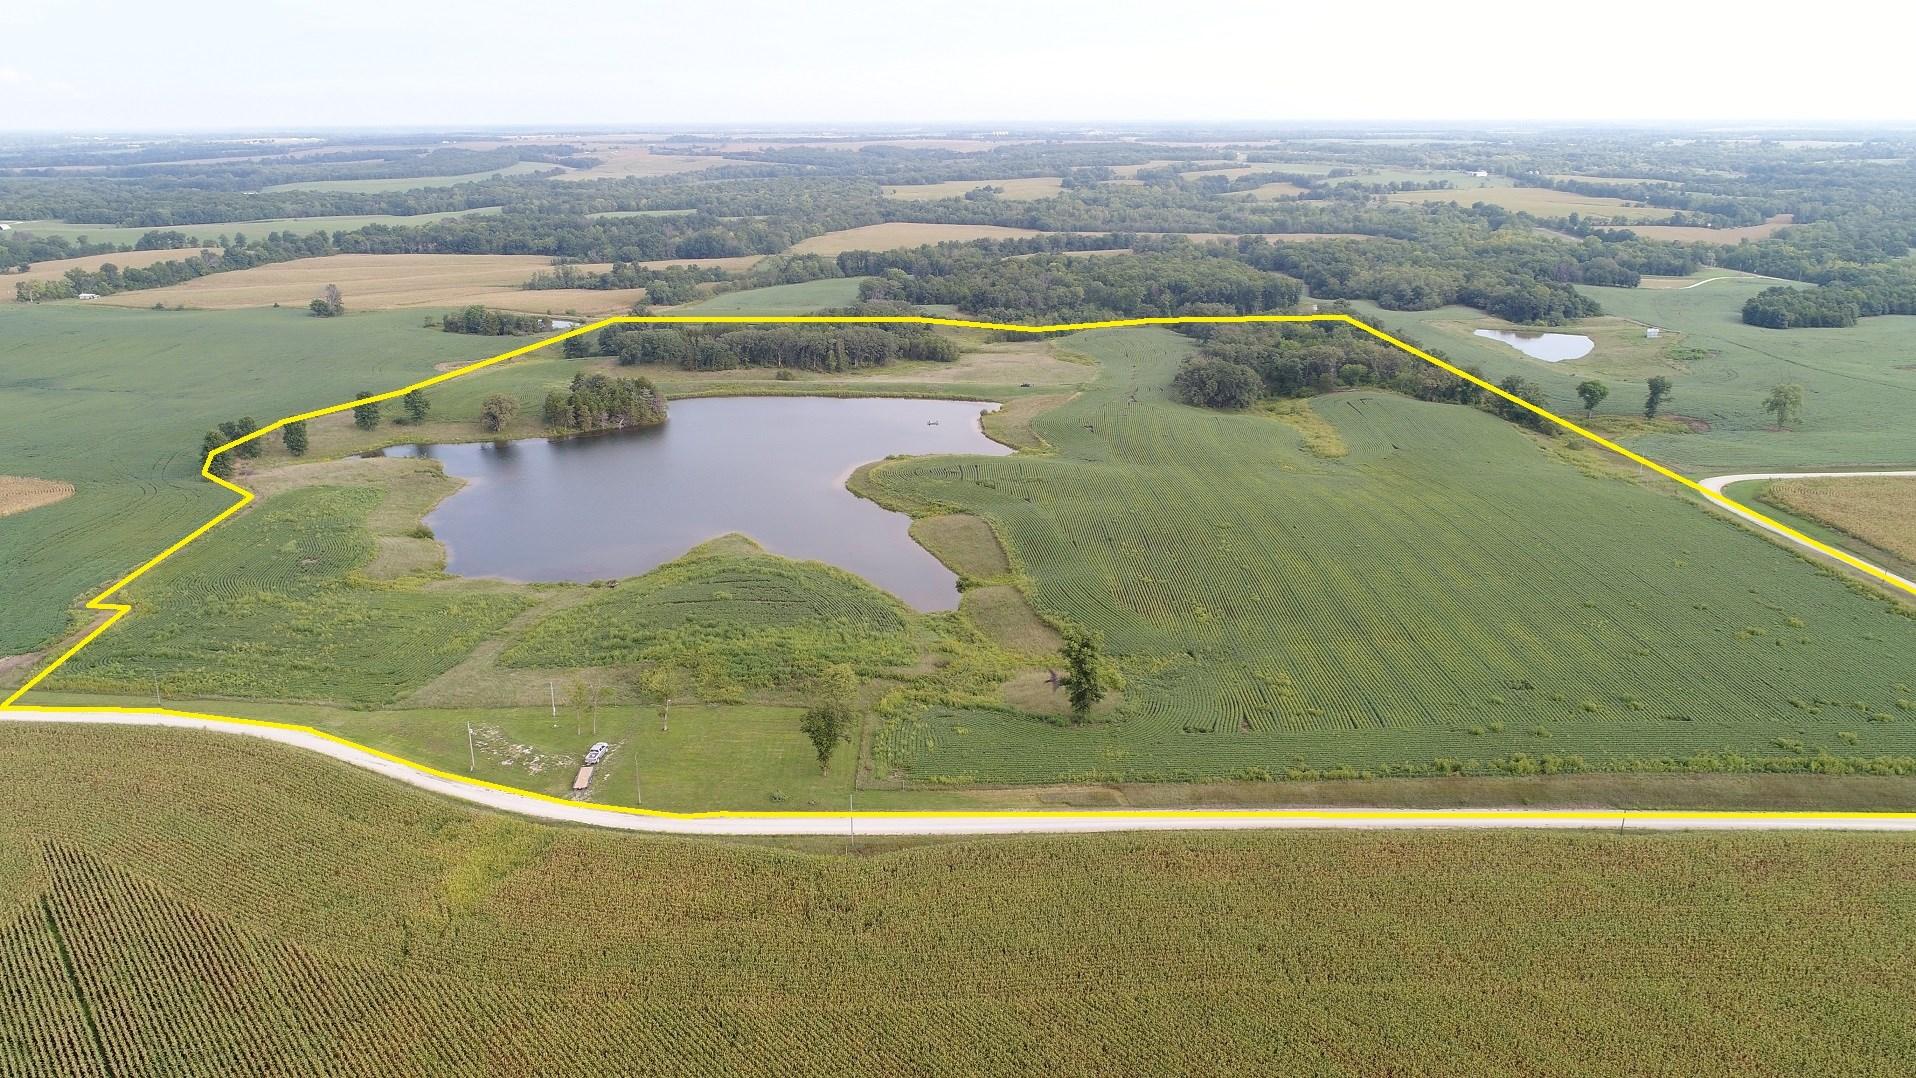 MO LAND FOR SALE, LAKE PROPERTY,FARM, WHITETAIL DEER HUNTING